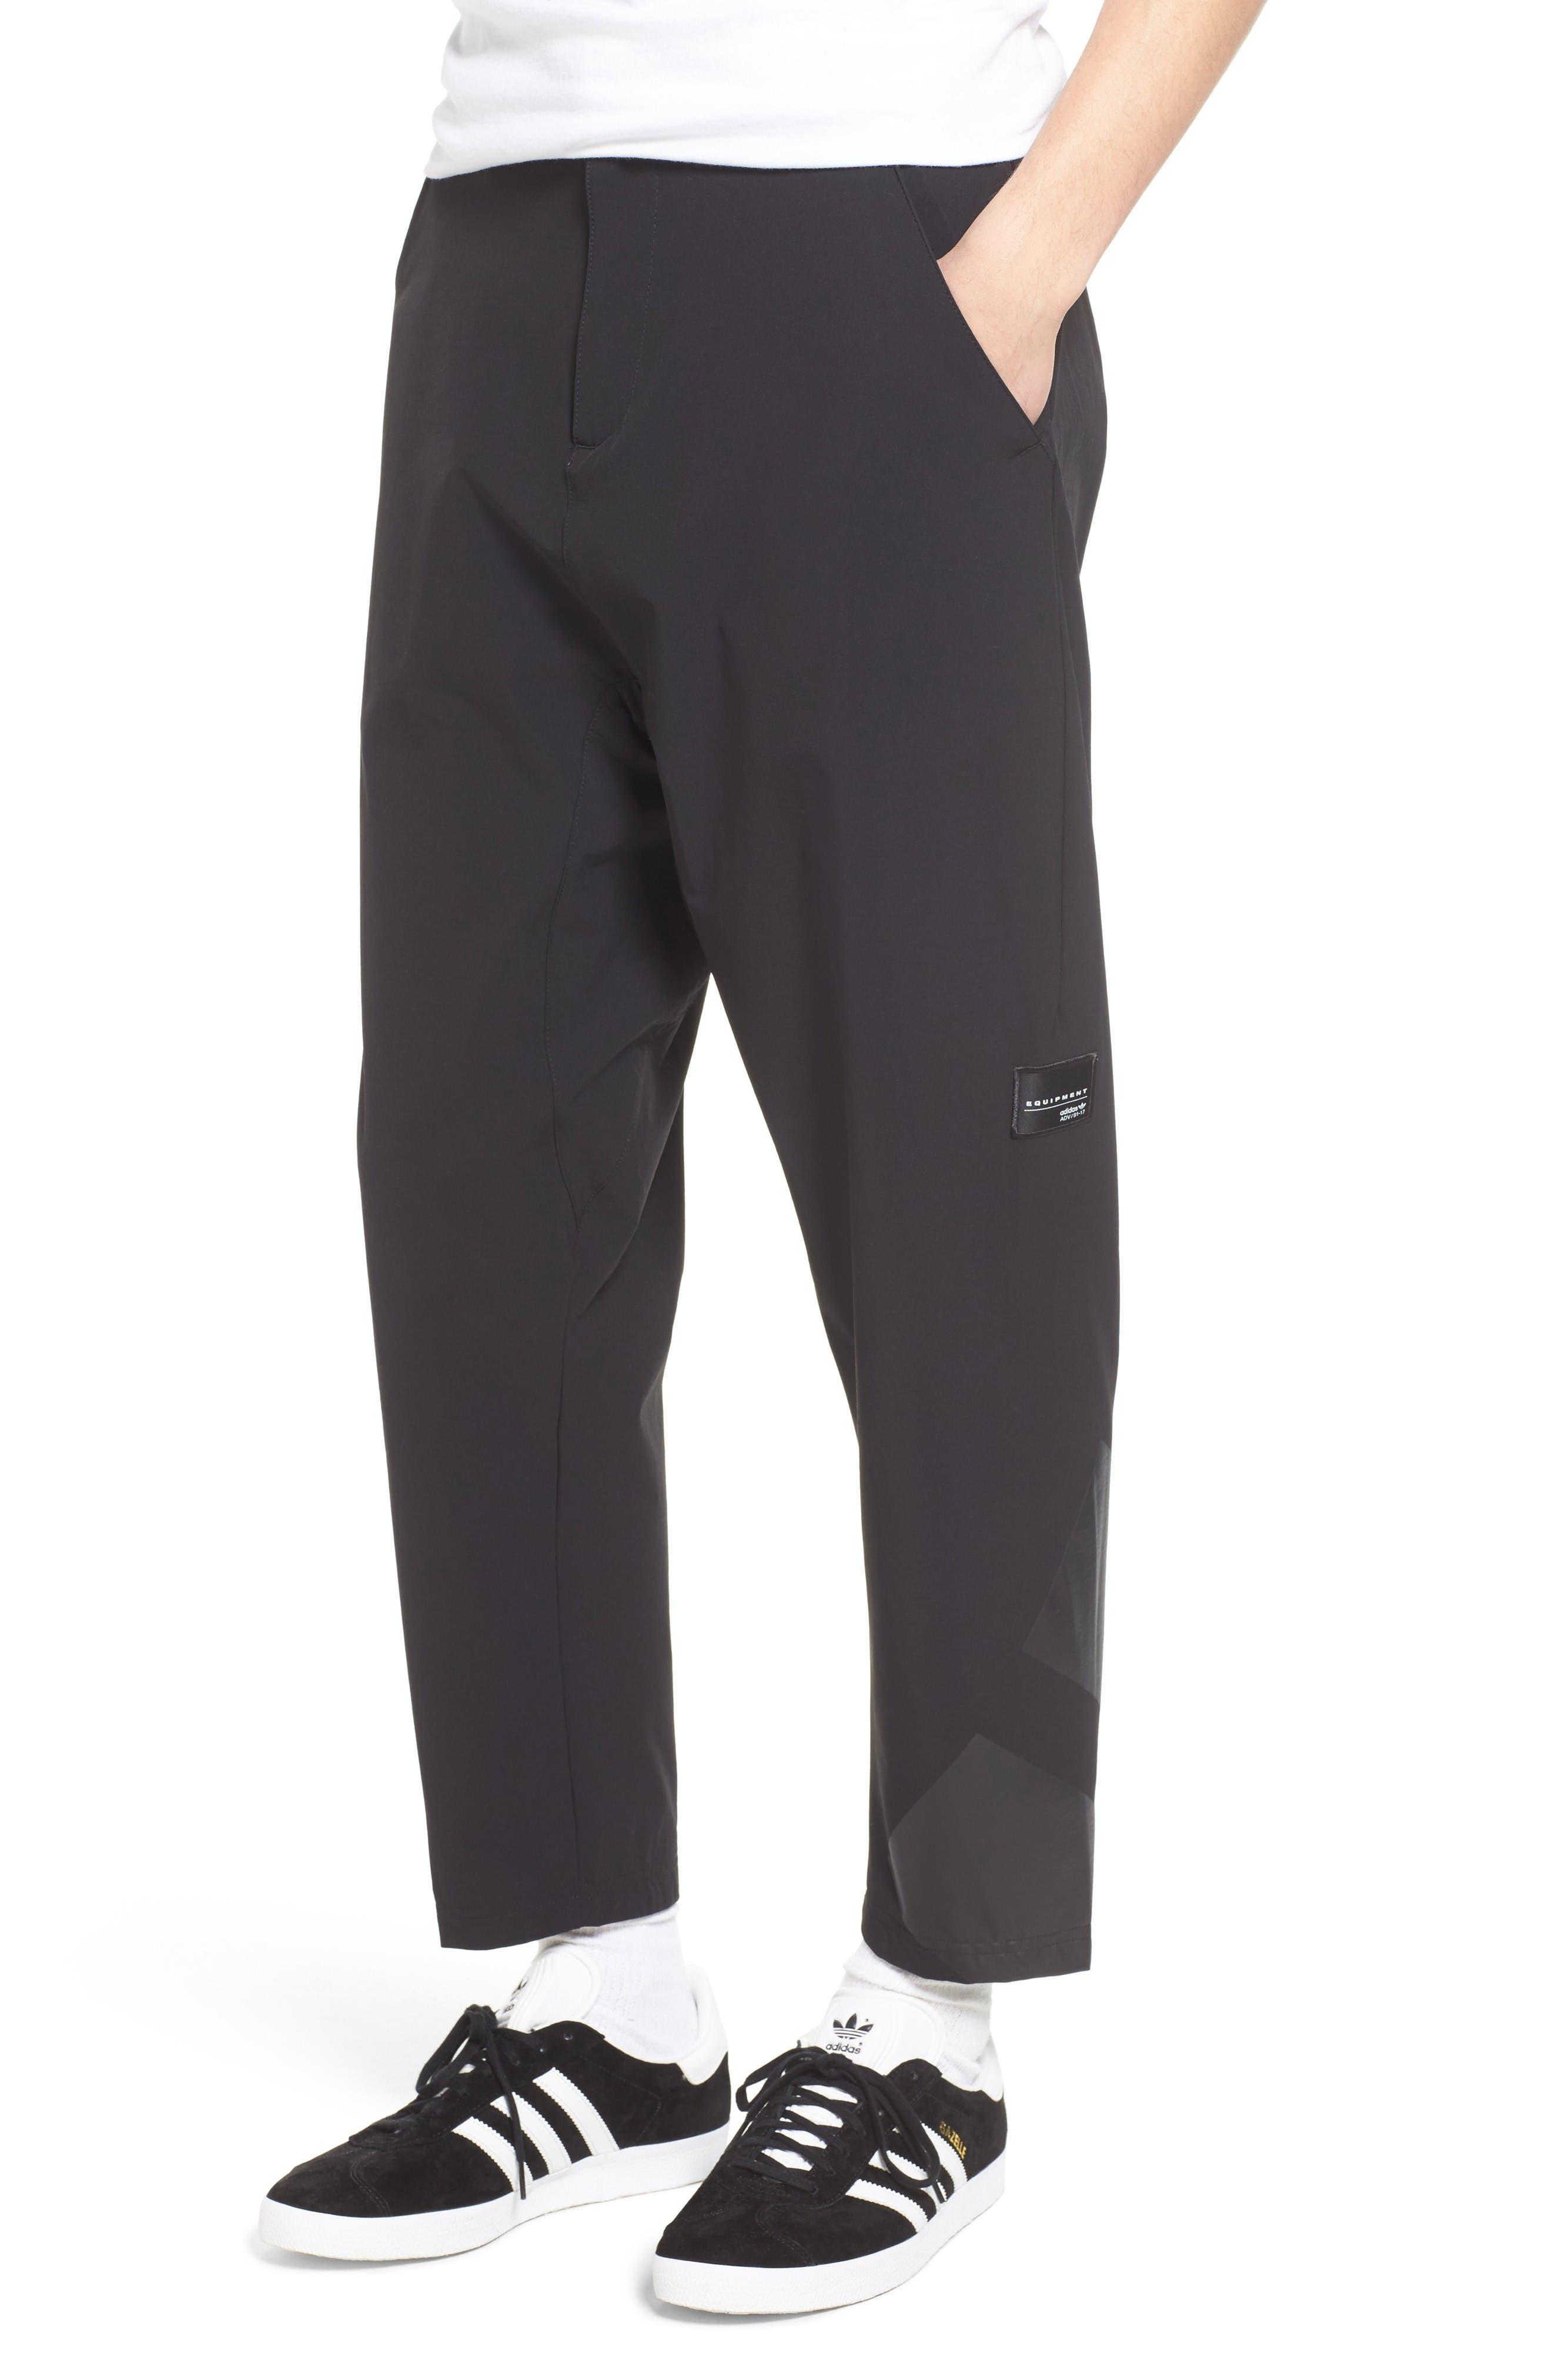 Alternate Image 1 Selected - adidas Originals EQT Tapered Track Pants